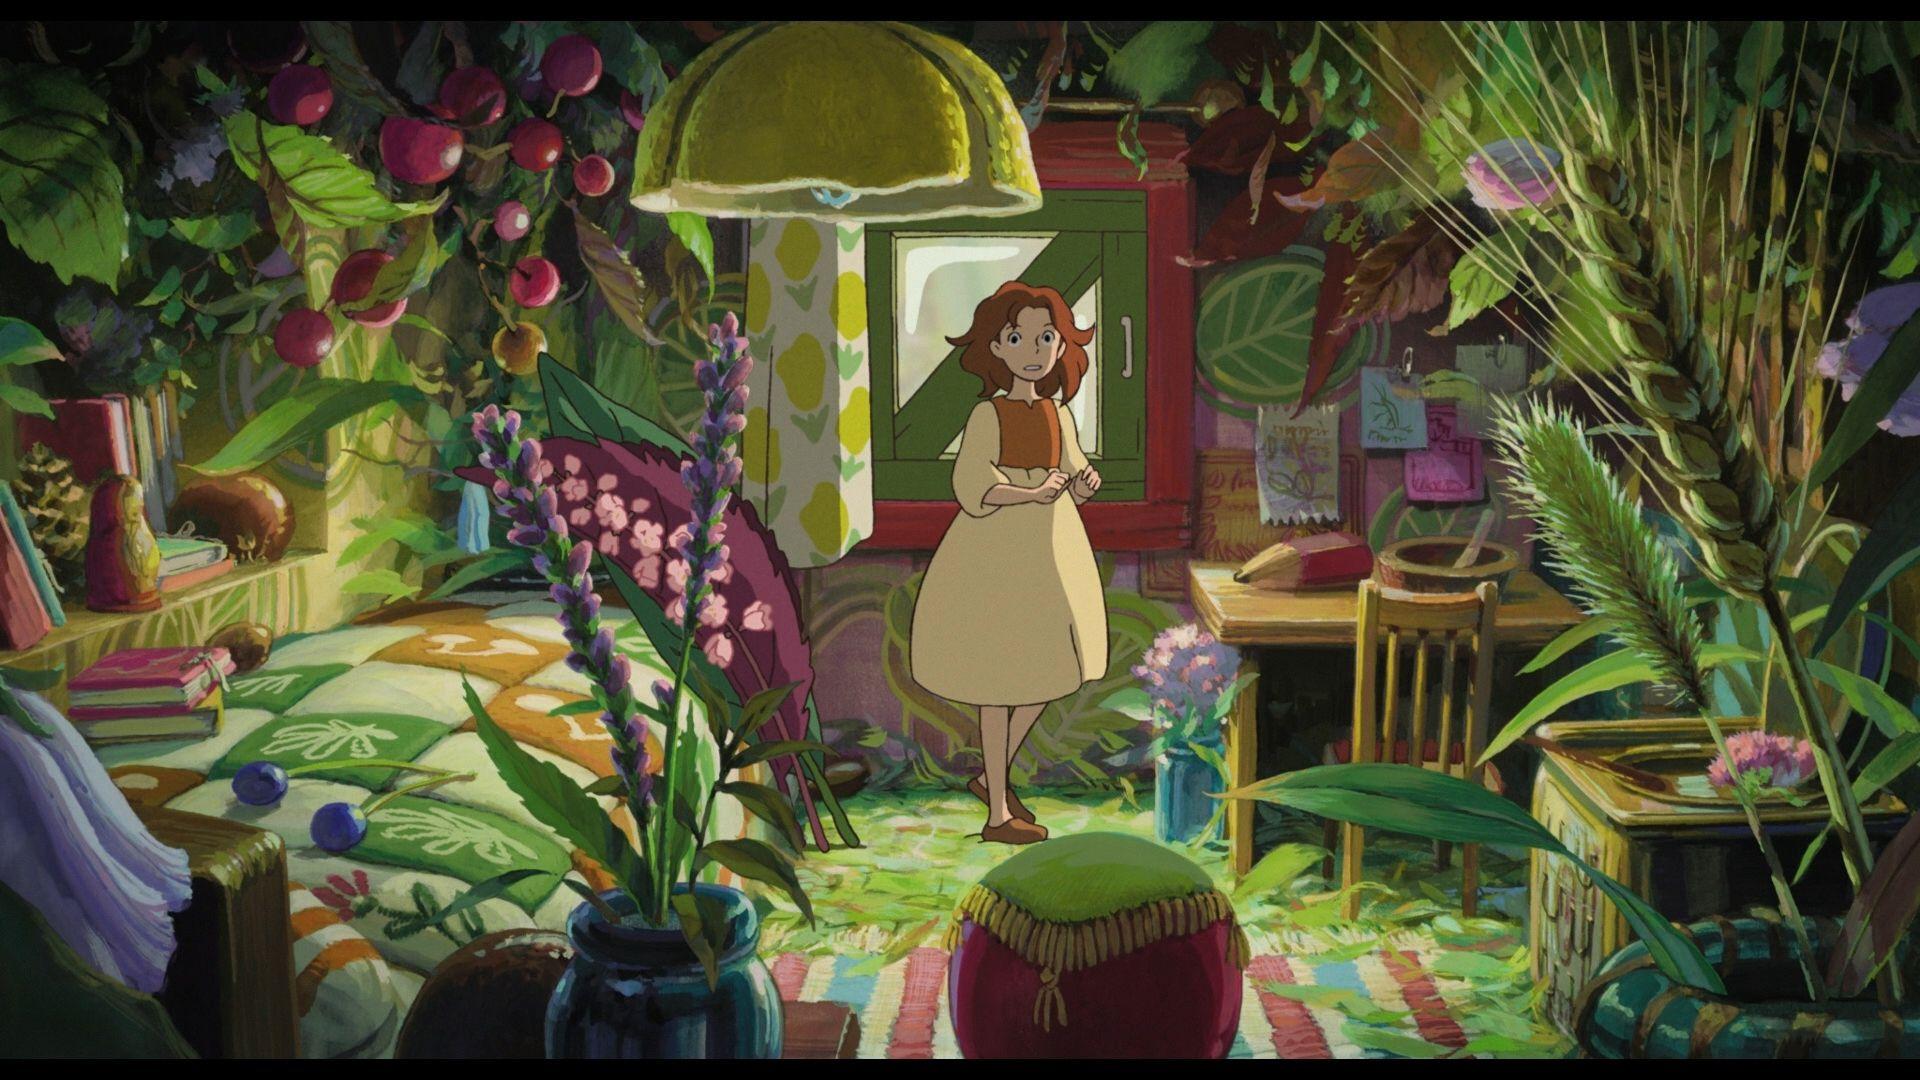 Dunia Rahasia Milik Arrietty: Merawat Imajinasi Anak